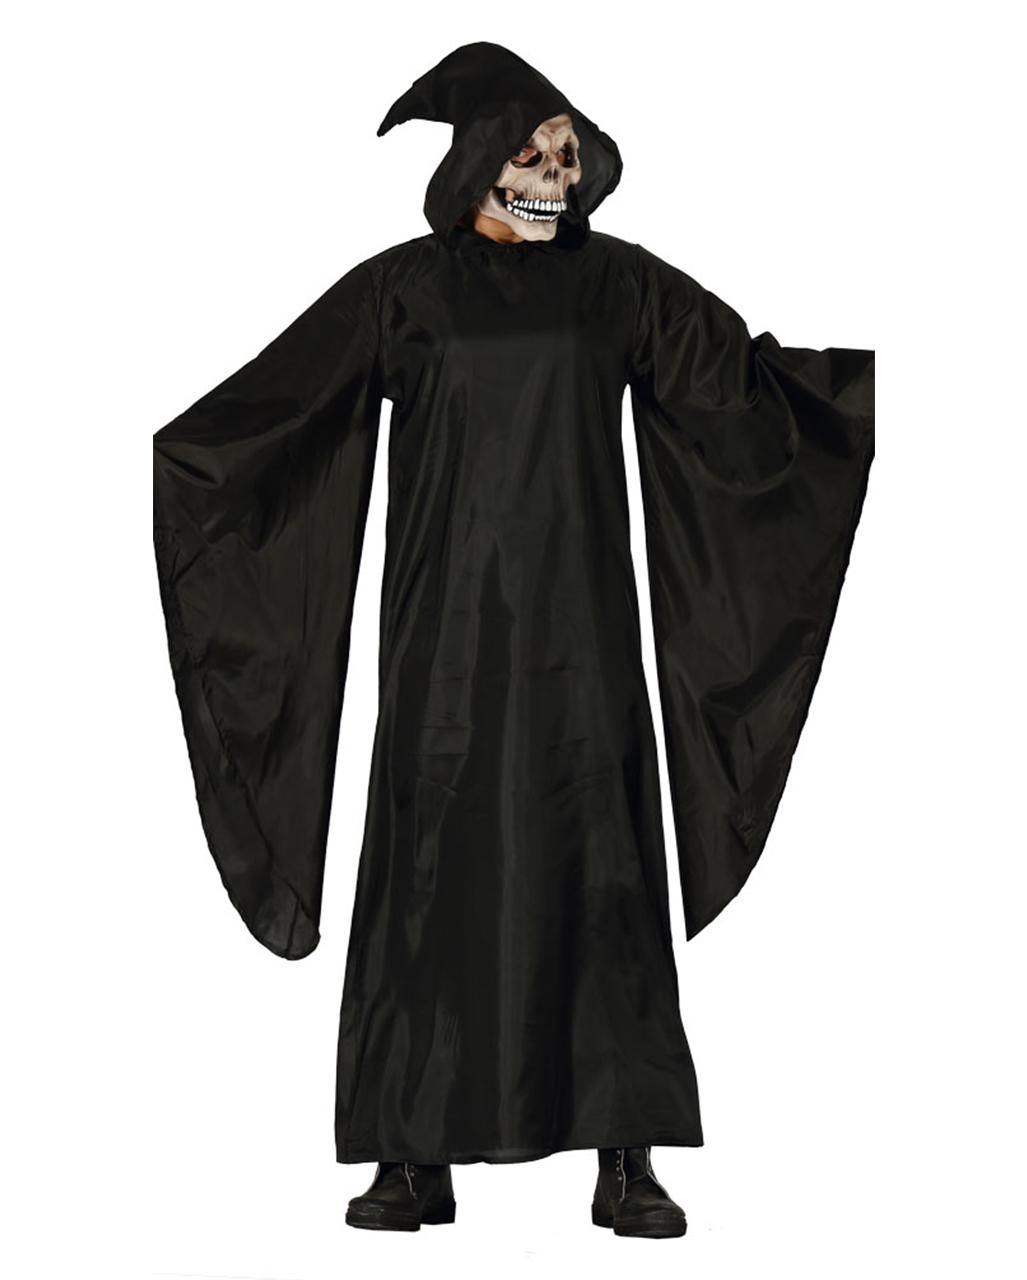 Grim Reaper Costume Adult Scary Skeleton Robe Halloween Fancy Dress